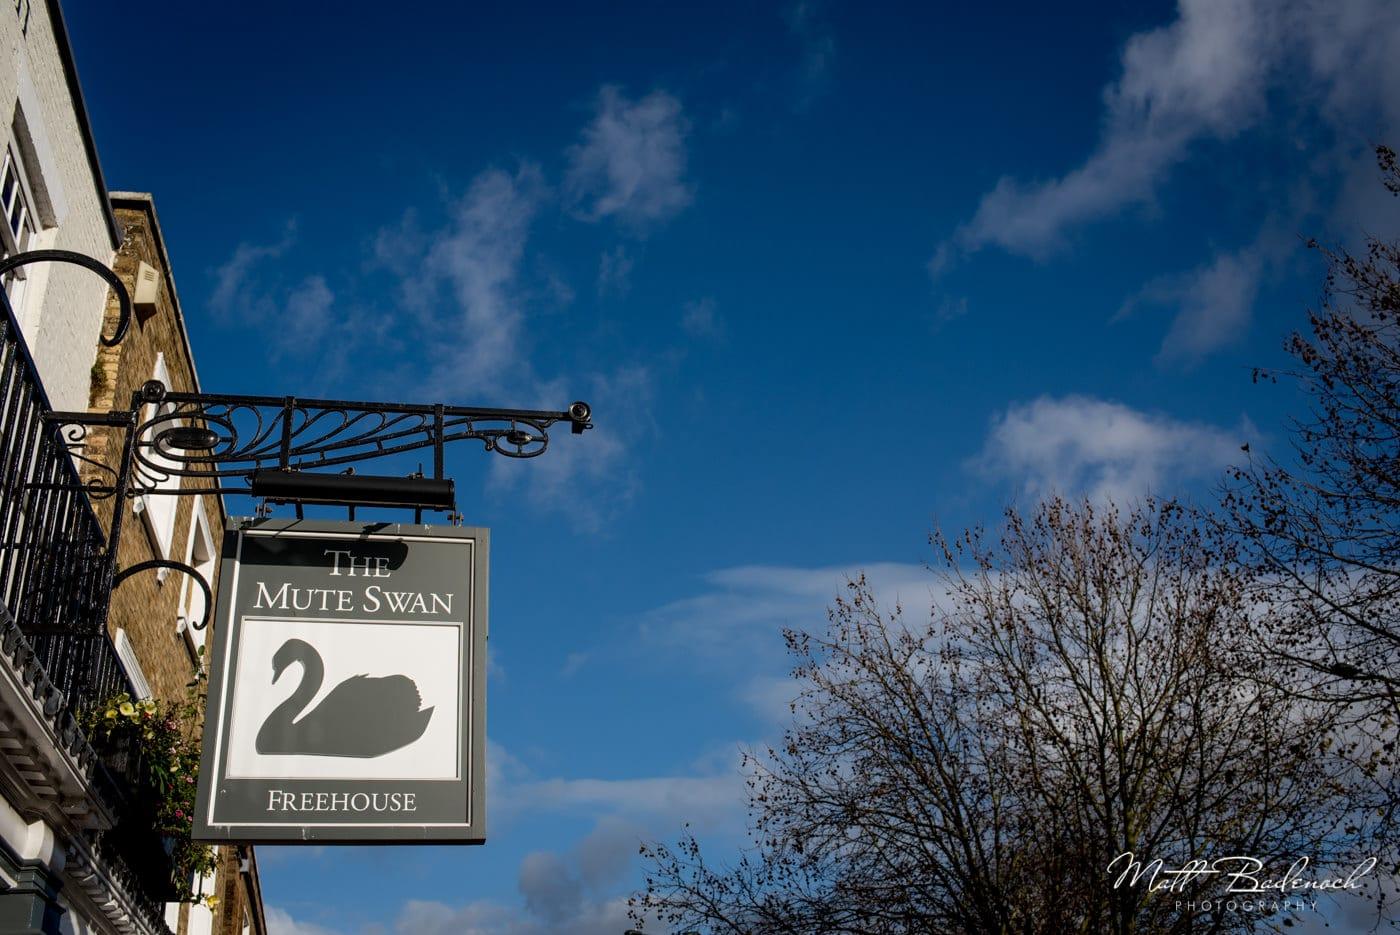 Mute Swam pub in Richmond